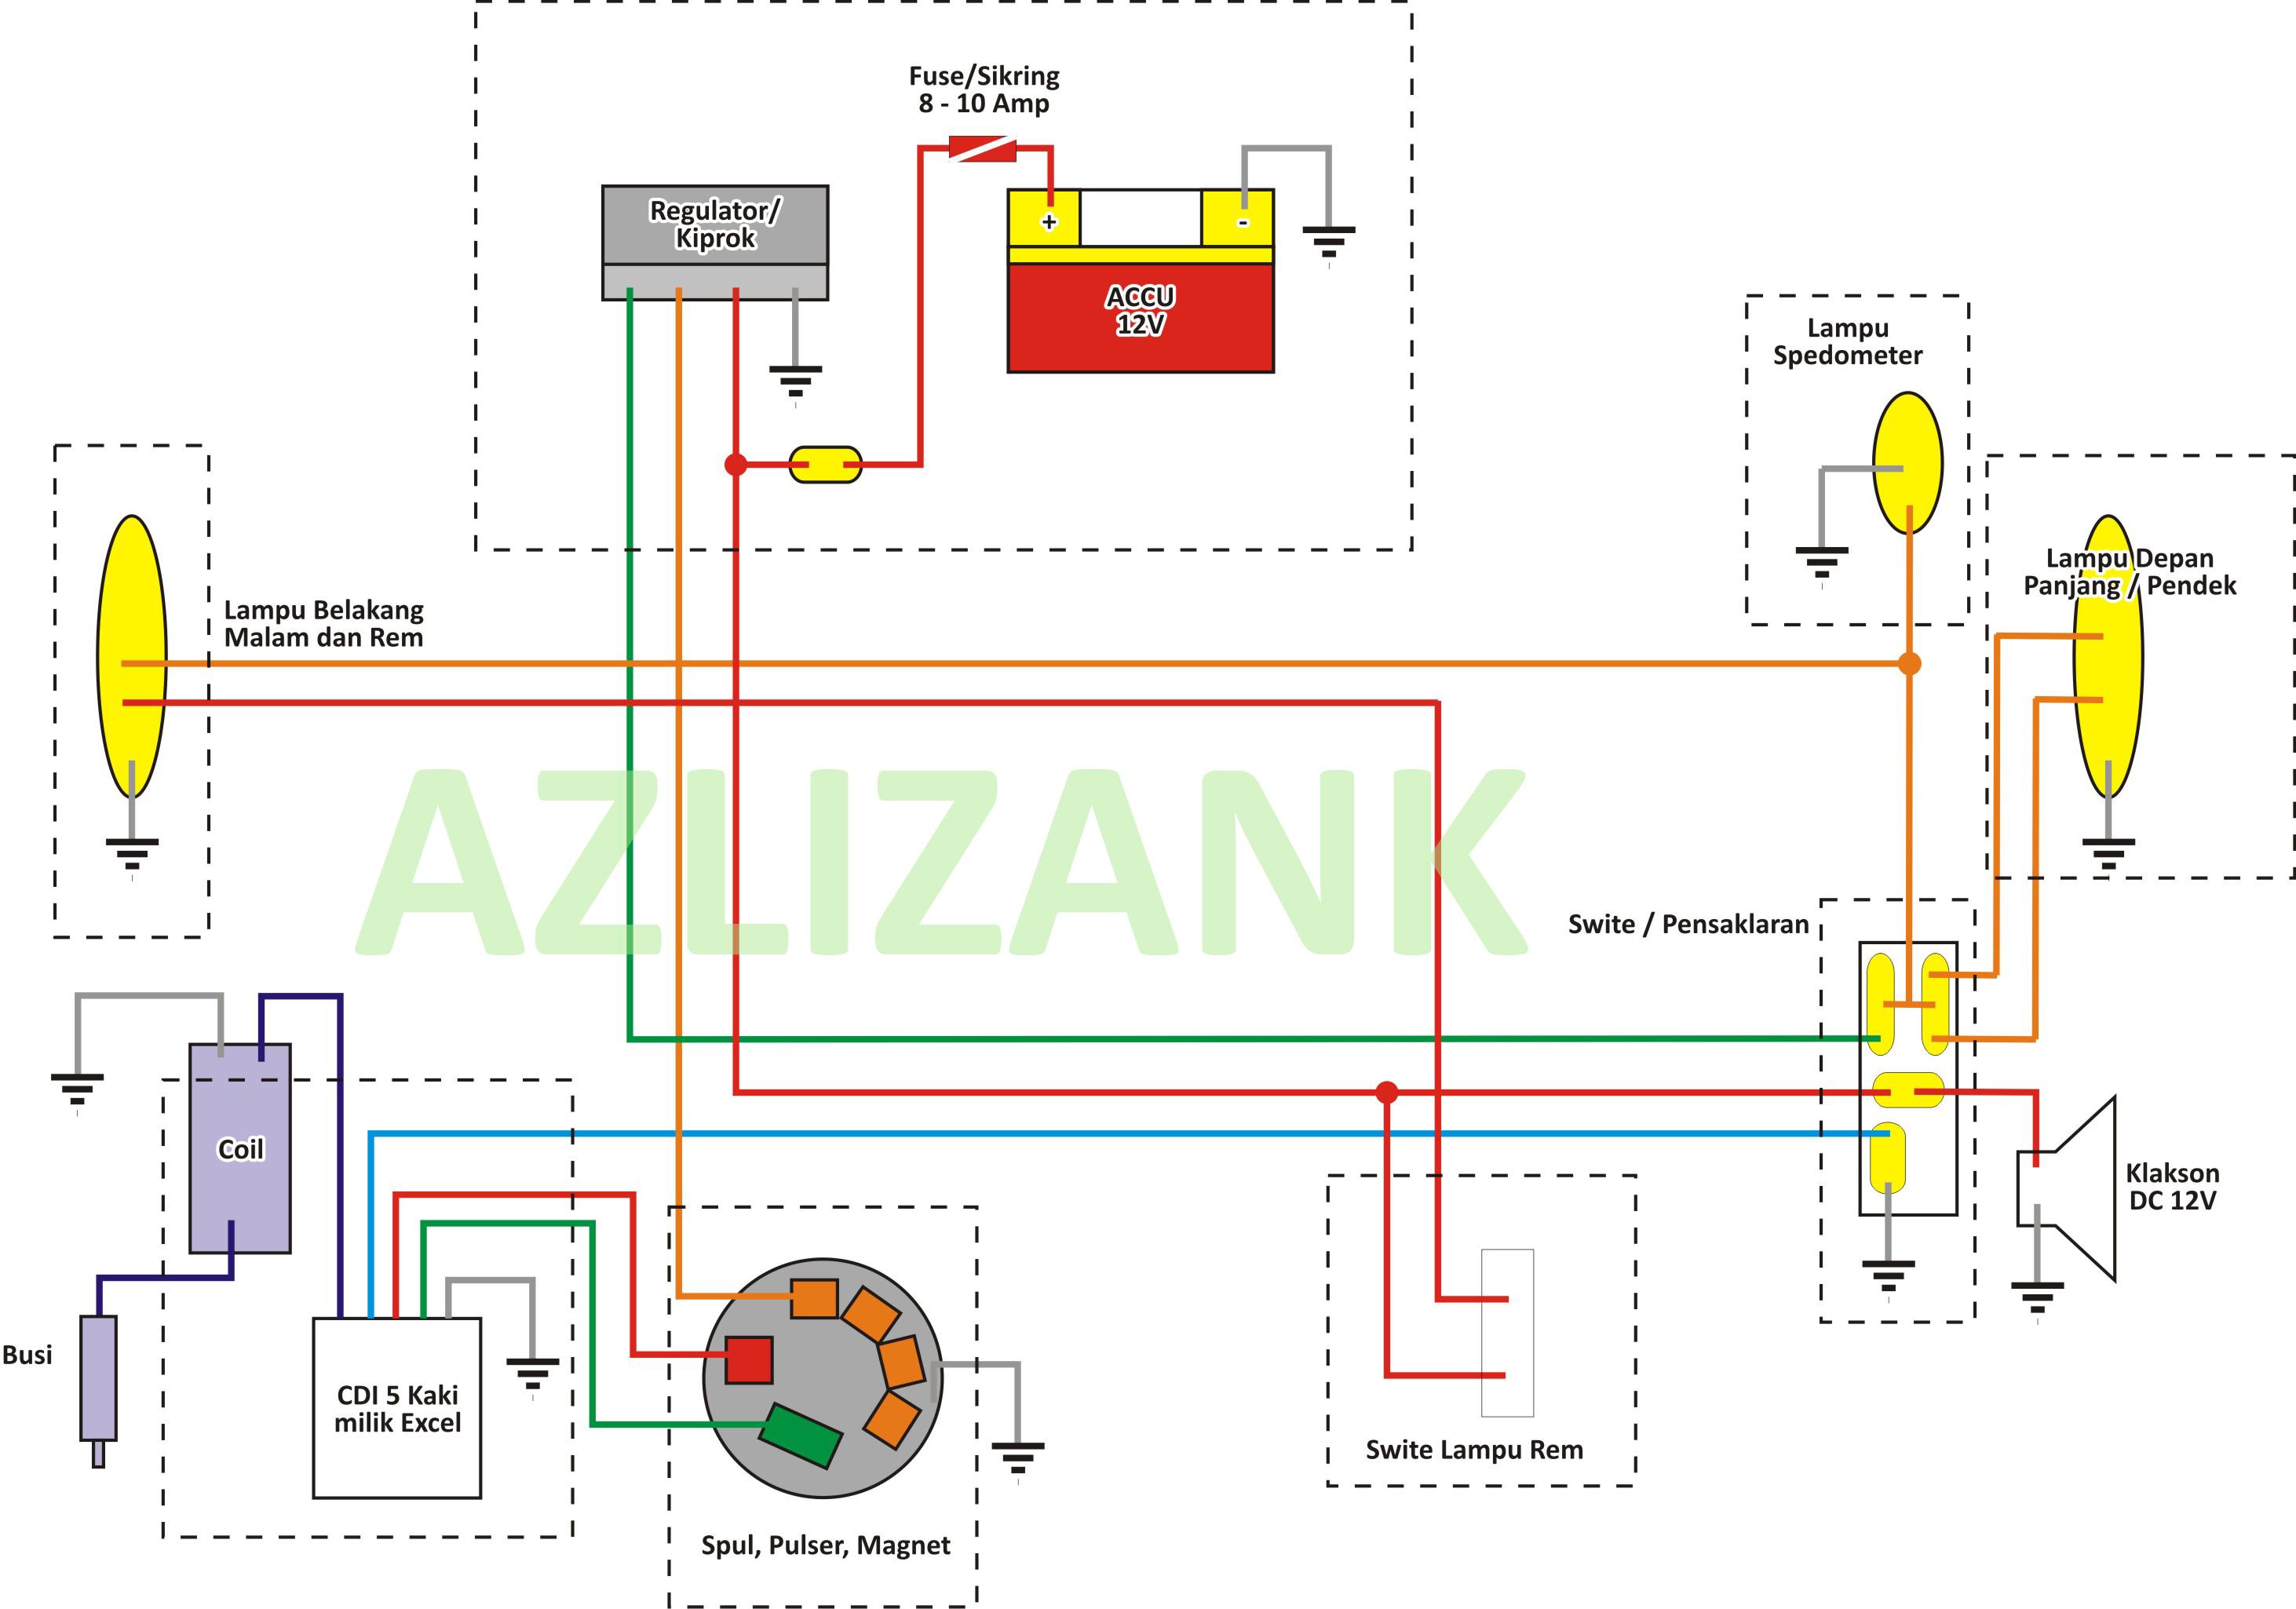 vespa vo wiring diagram wiring library tao tao 50cc moped wiring diagram vespa vo moped wiring diagram [ 2925 x 2050 Pixel ]